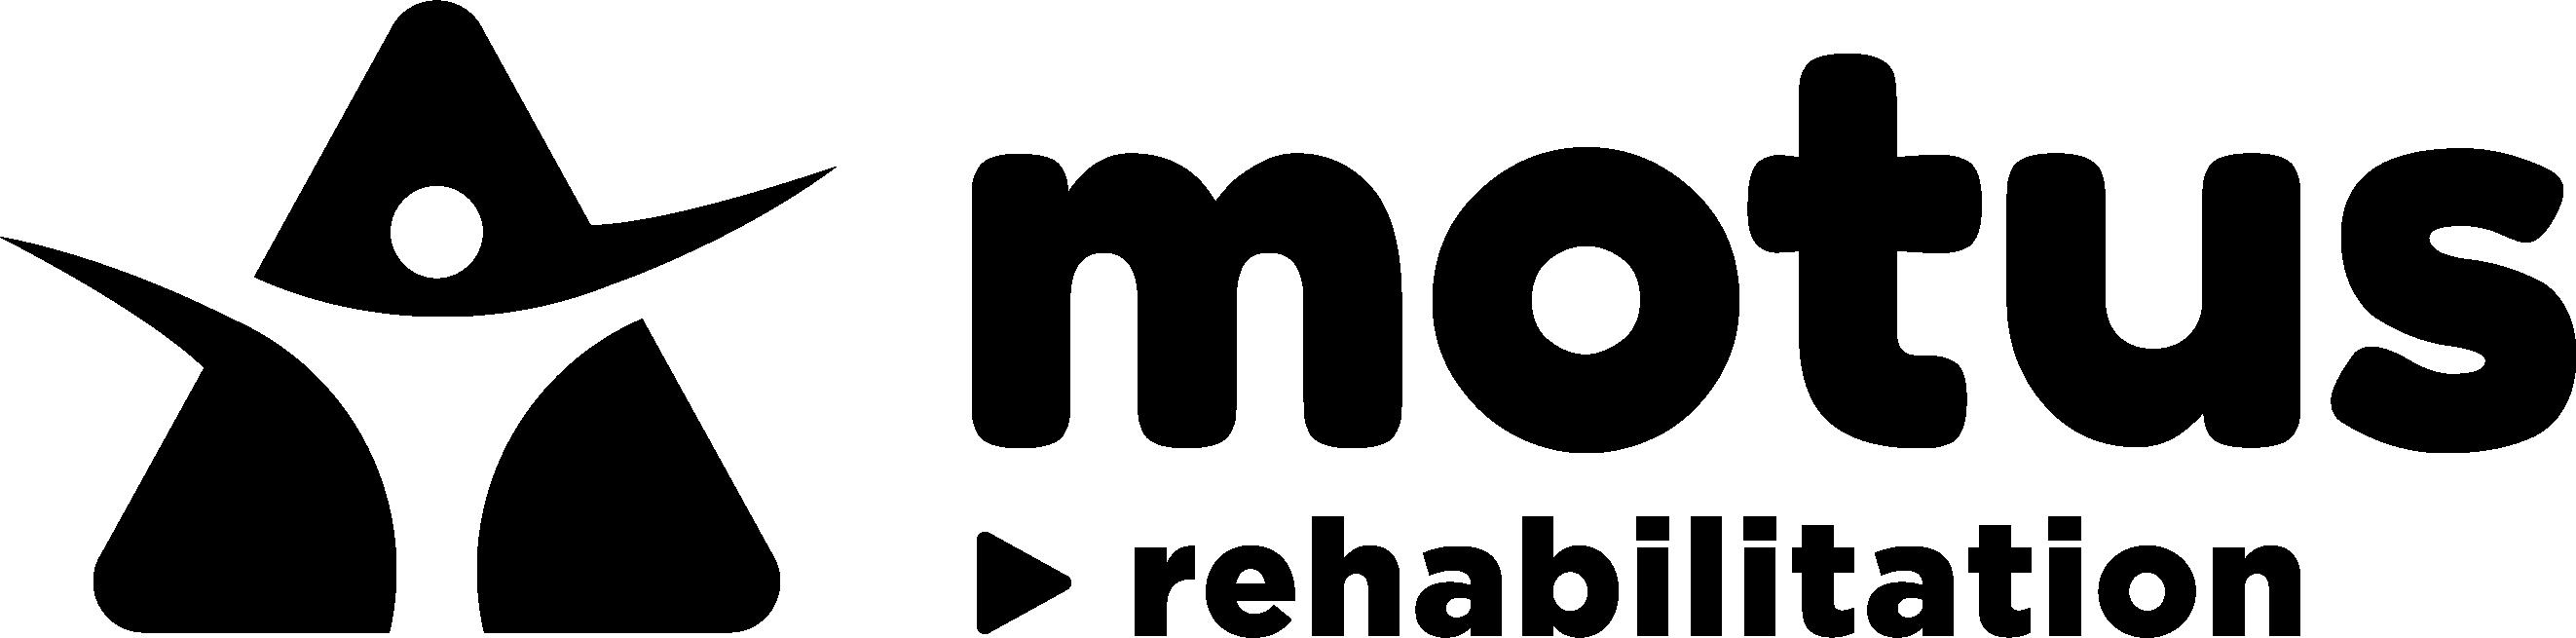 Motus Logo one color